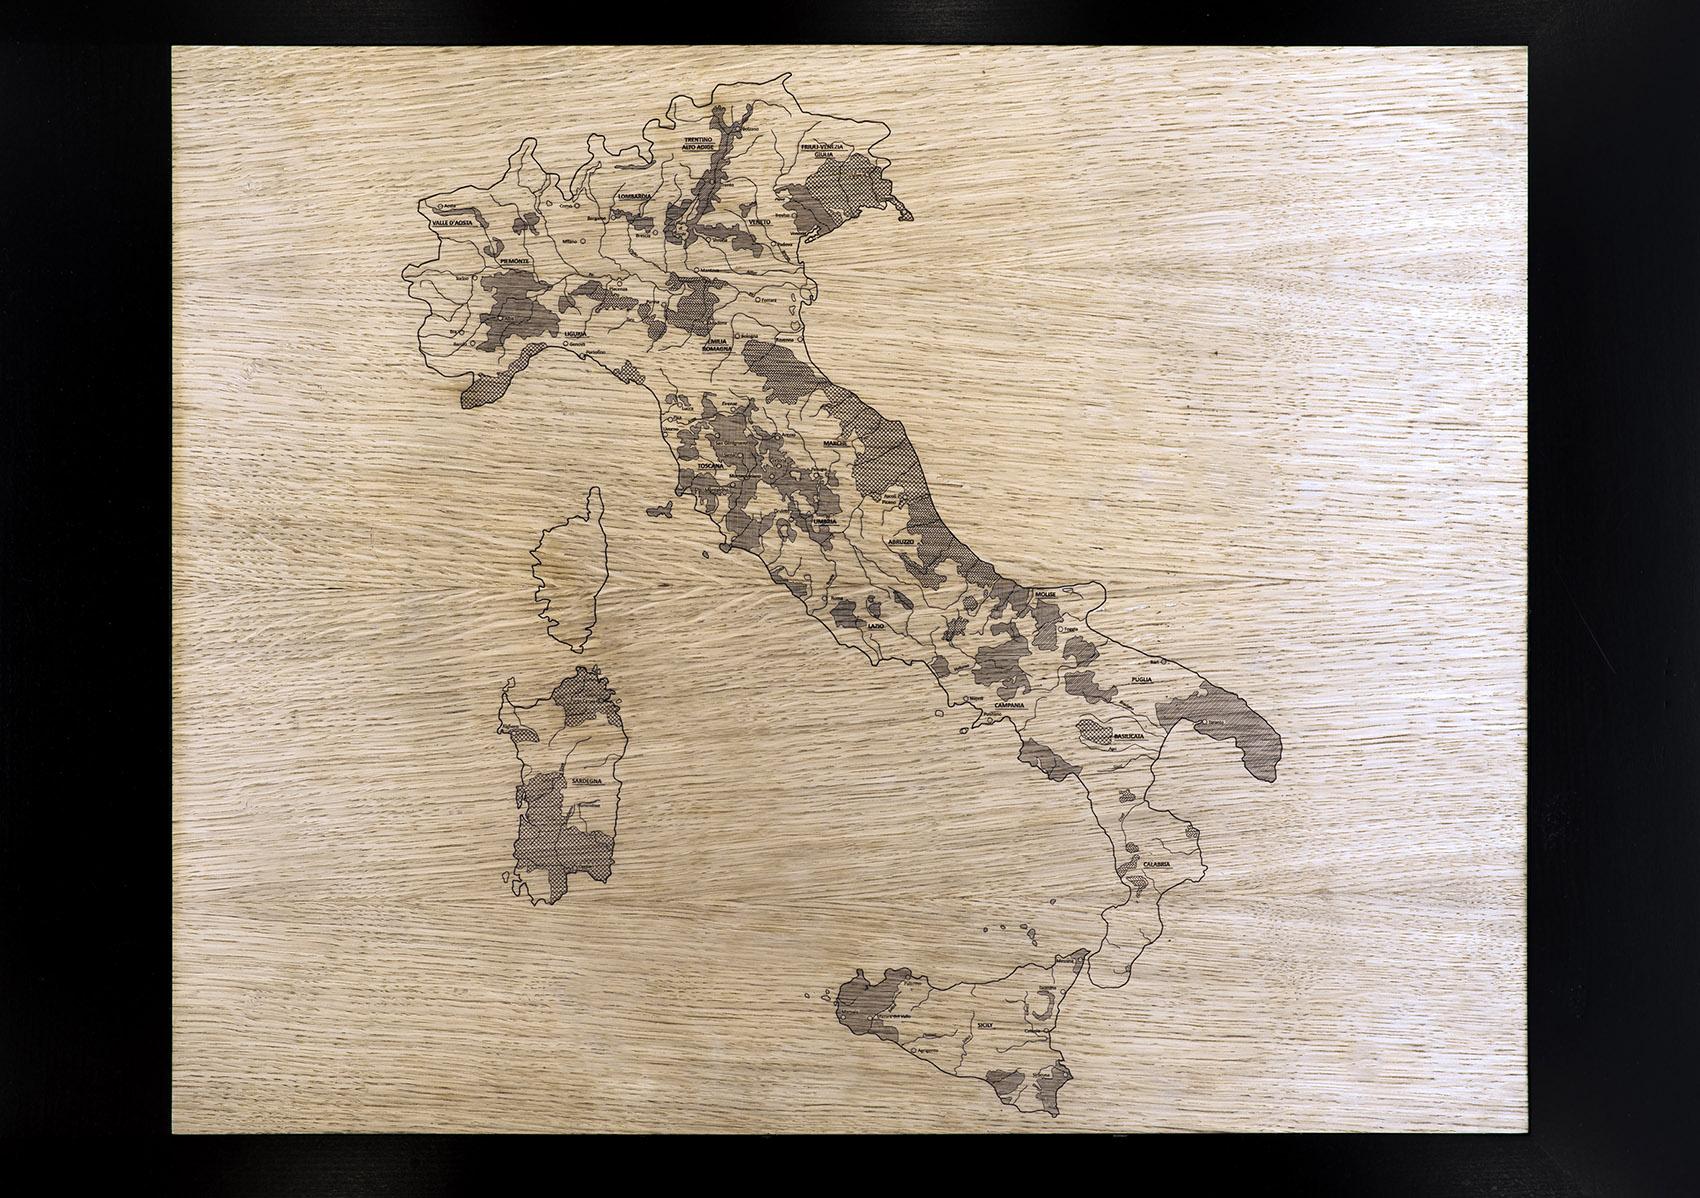 013-Wineshop-Clad-with-2100-Engraved-Oak-Panels (1)